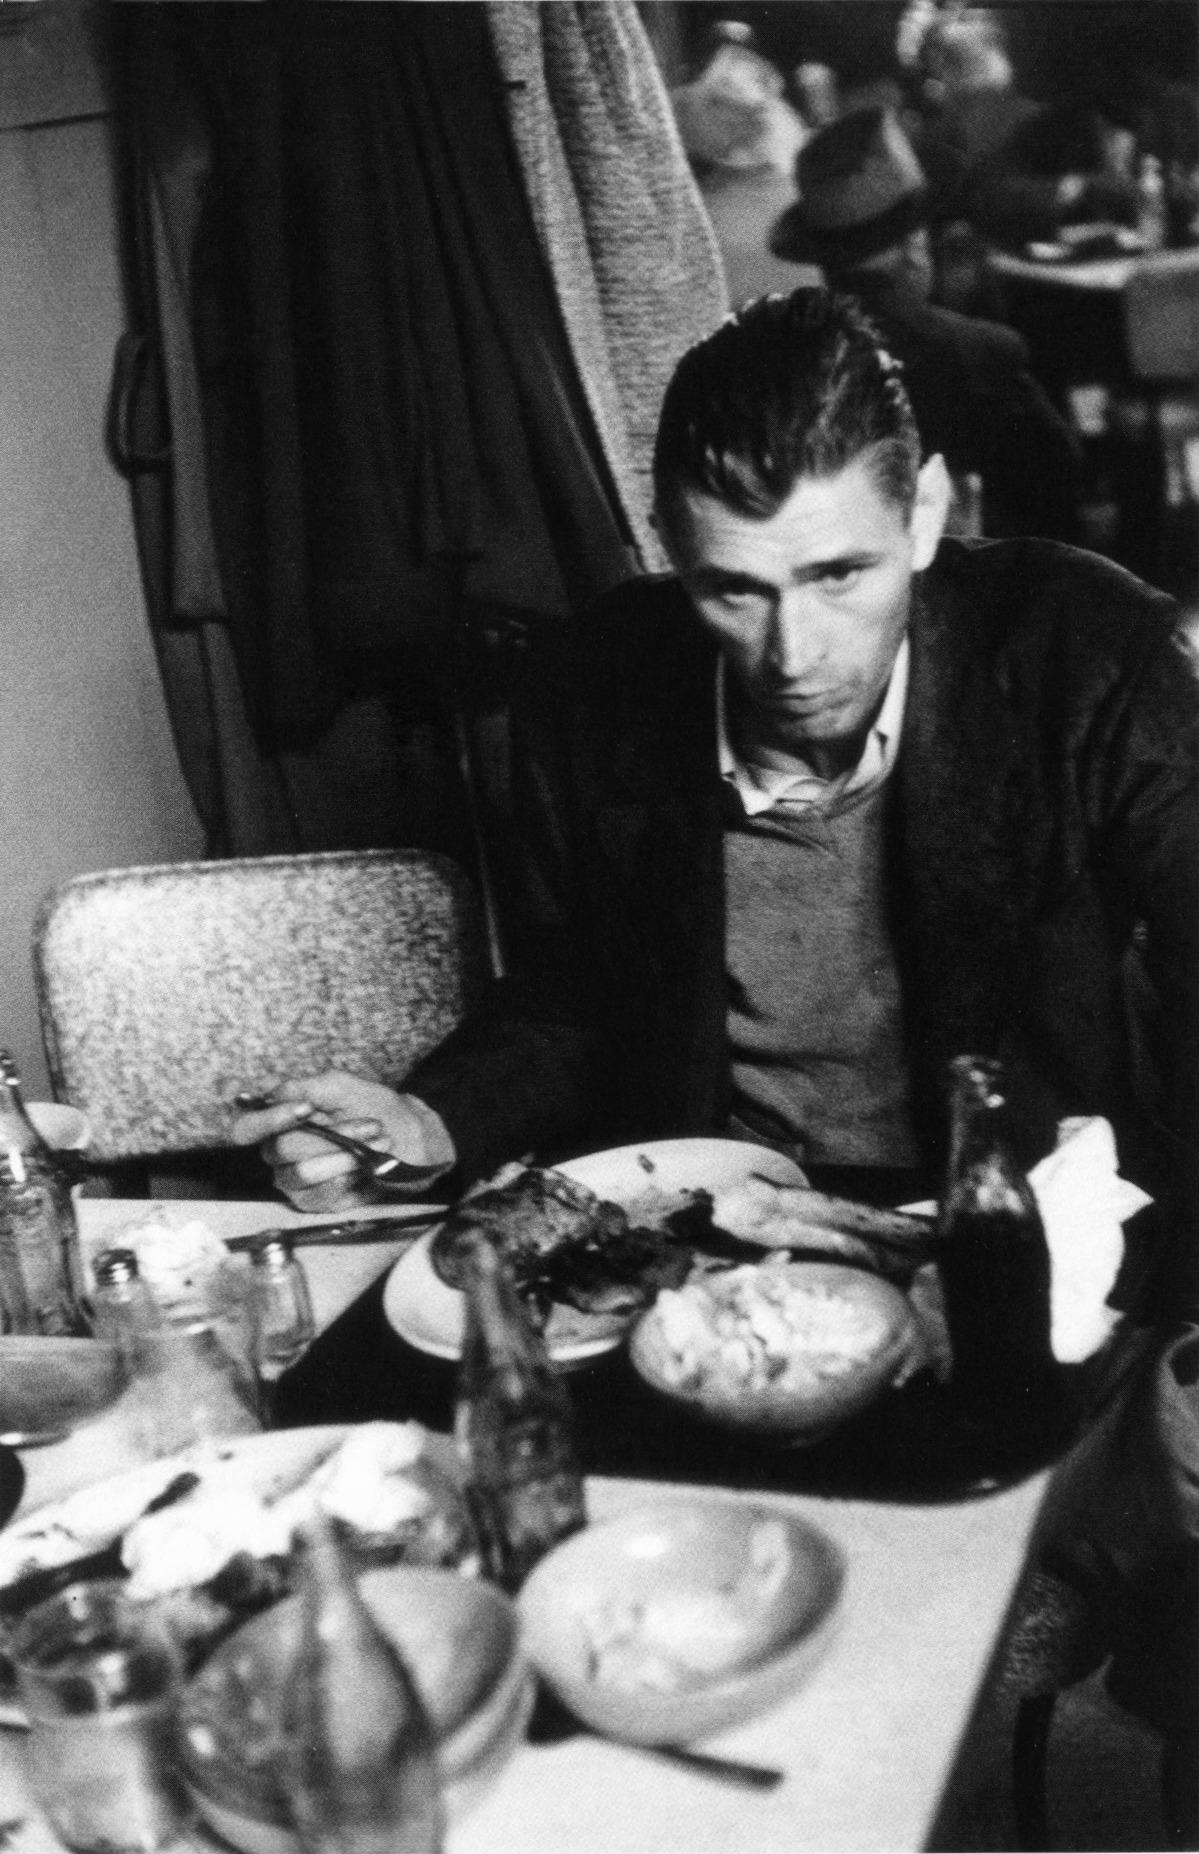 #68 Cafeteria-San Francisco, 1956